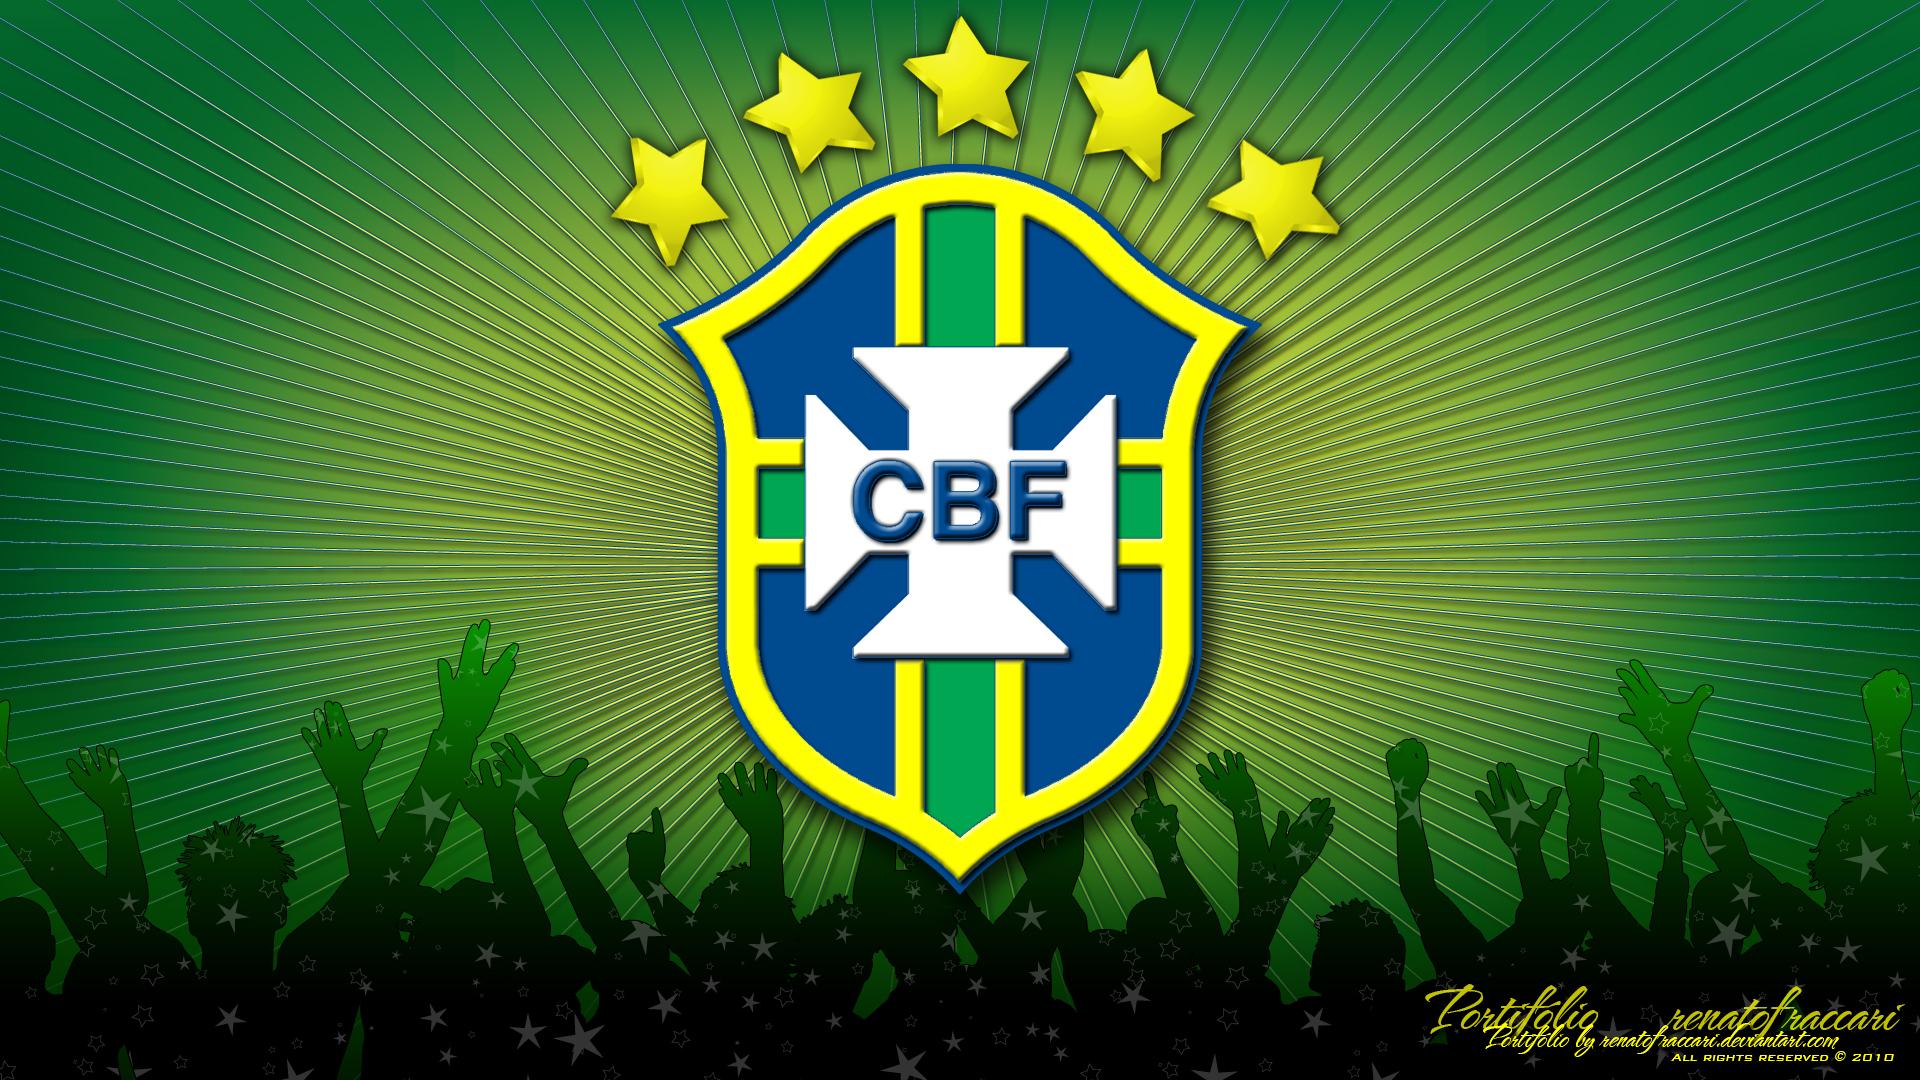 Brazil Fc wallpaper 189770